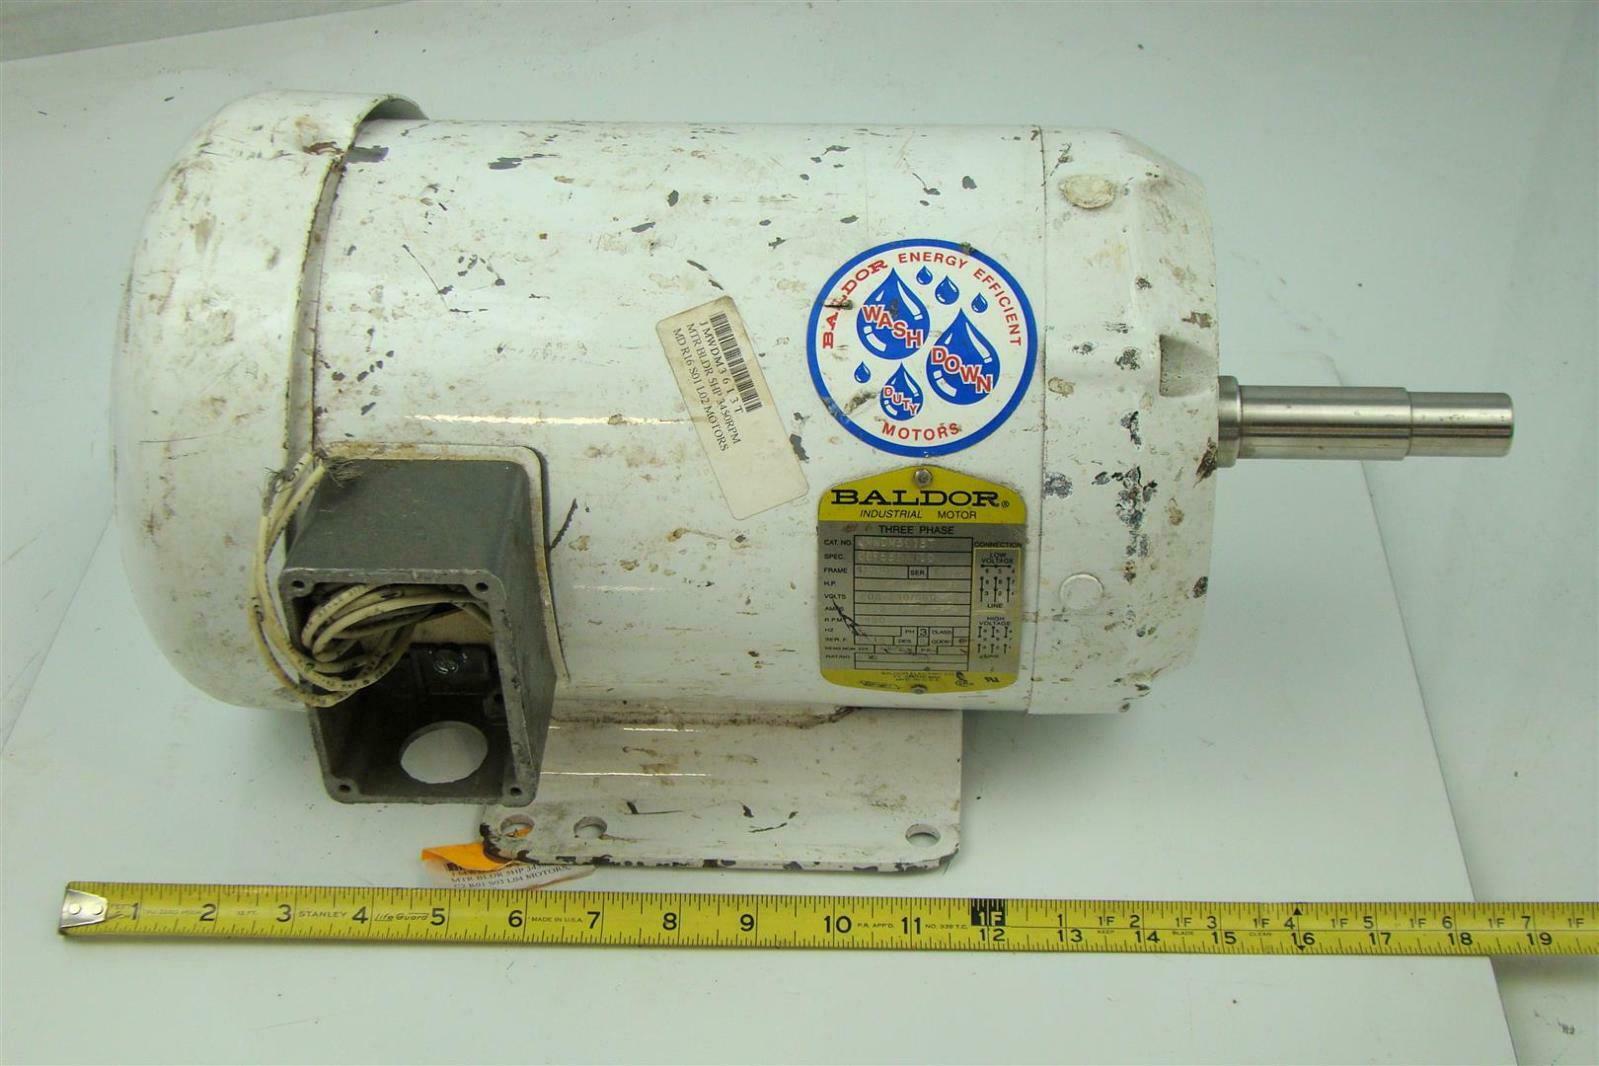 Baldor electricric motor 5hp 230 460v washdown duty for Baldor reliance motor parts